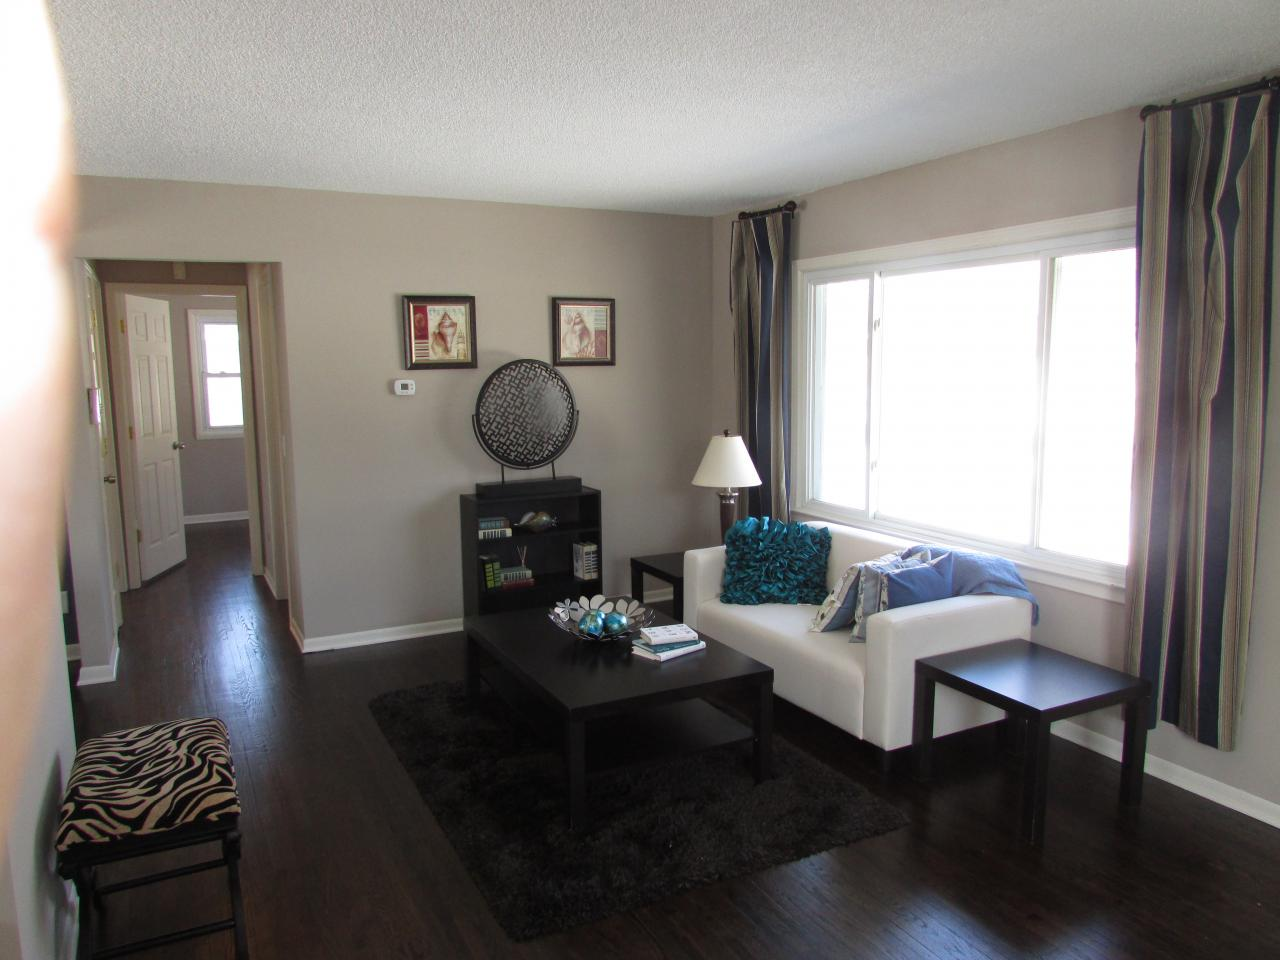 Magnolia Living Room - after